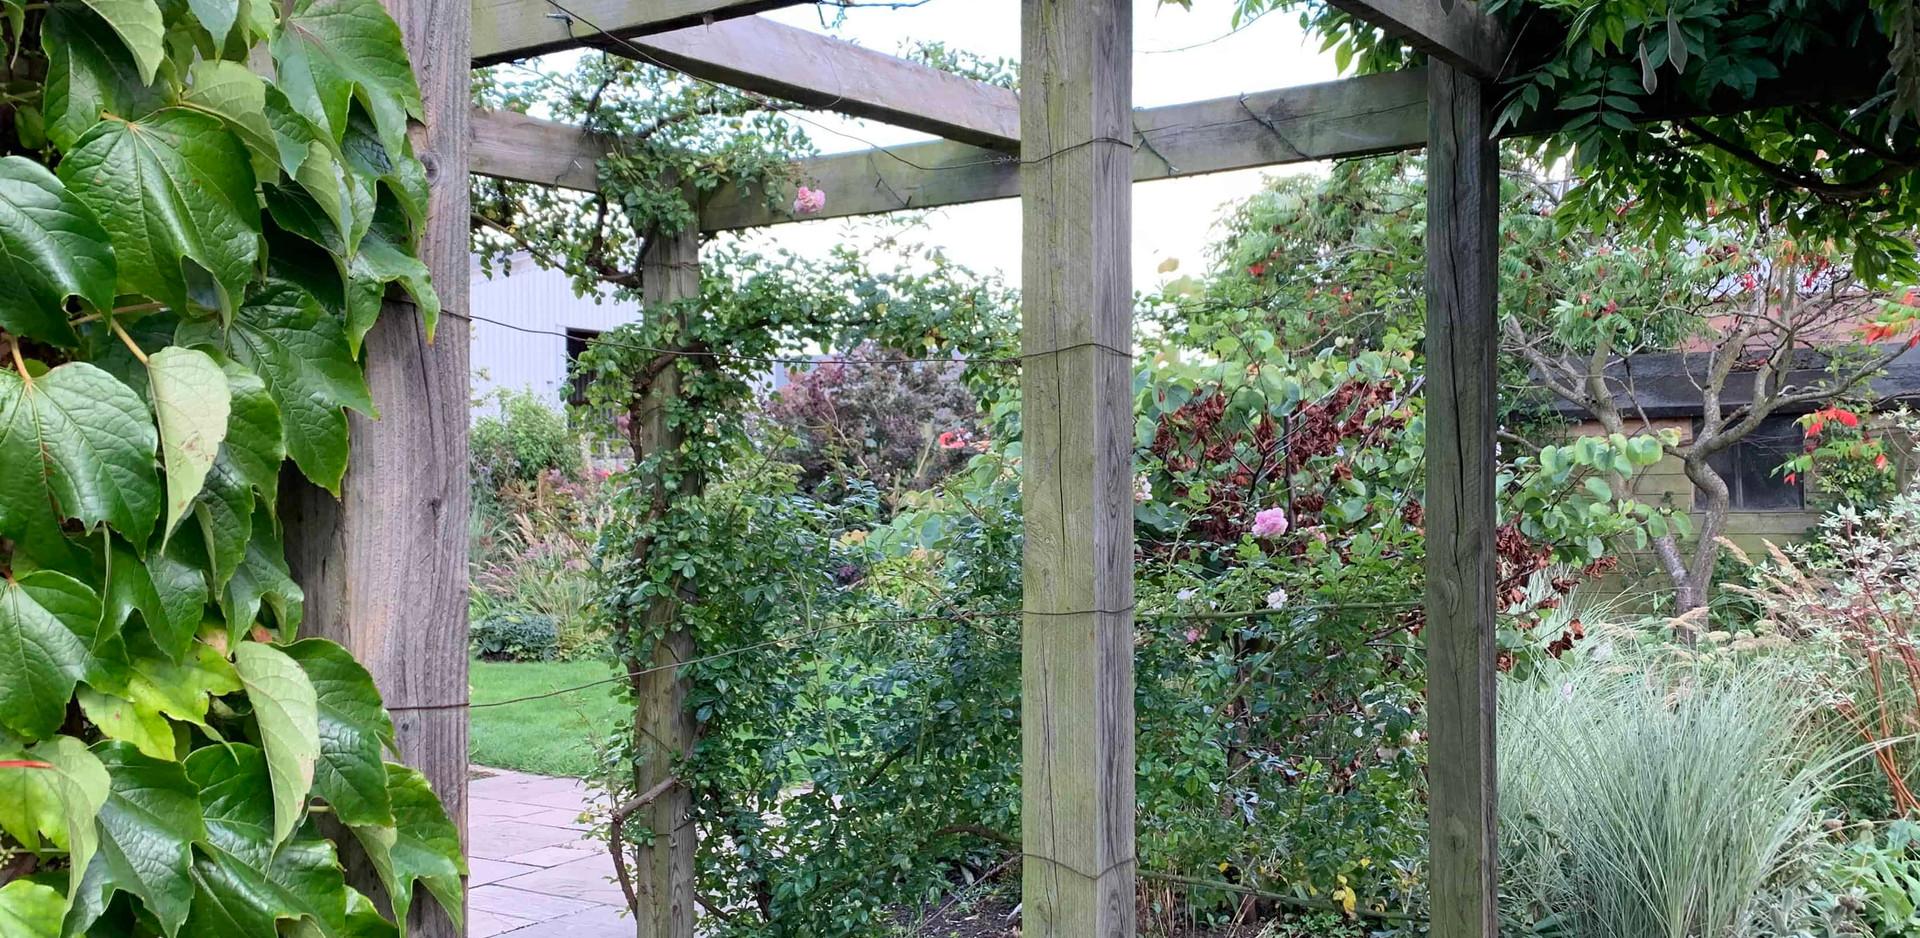 Established cottage garden planting and pergola in Aslockton